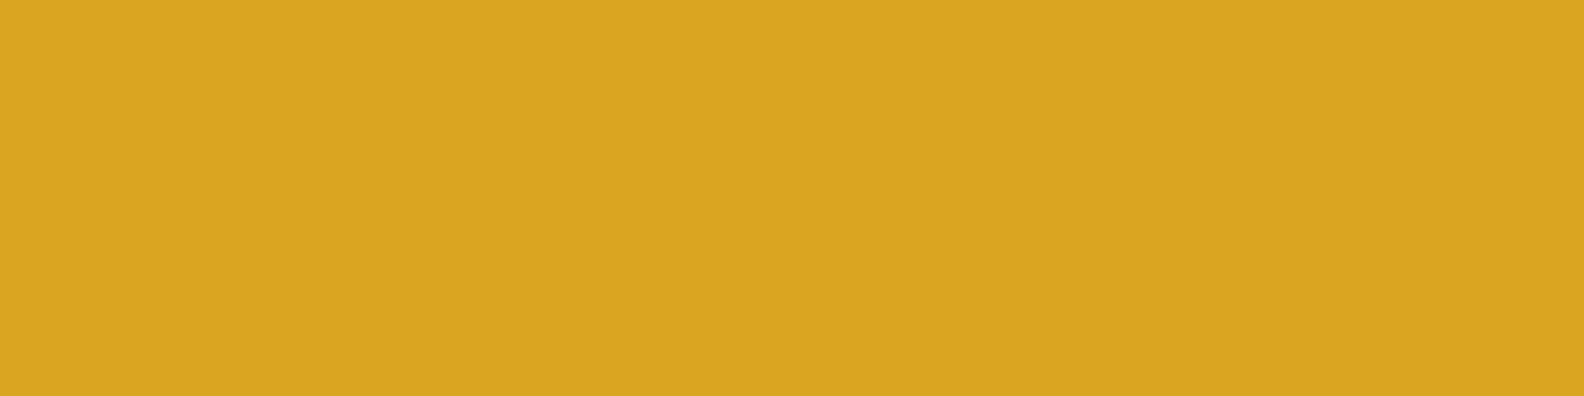 1584x396 Goldenrod Solid Color Background